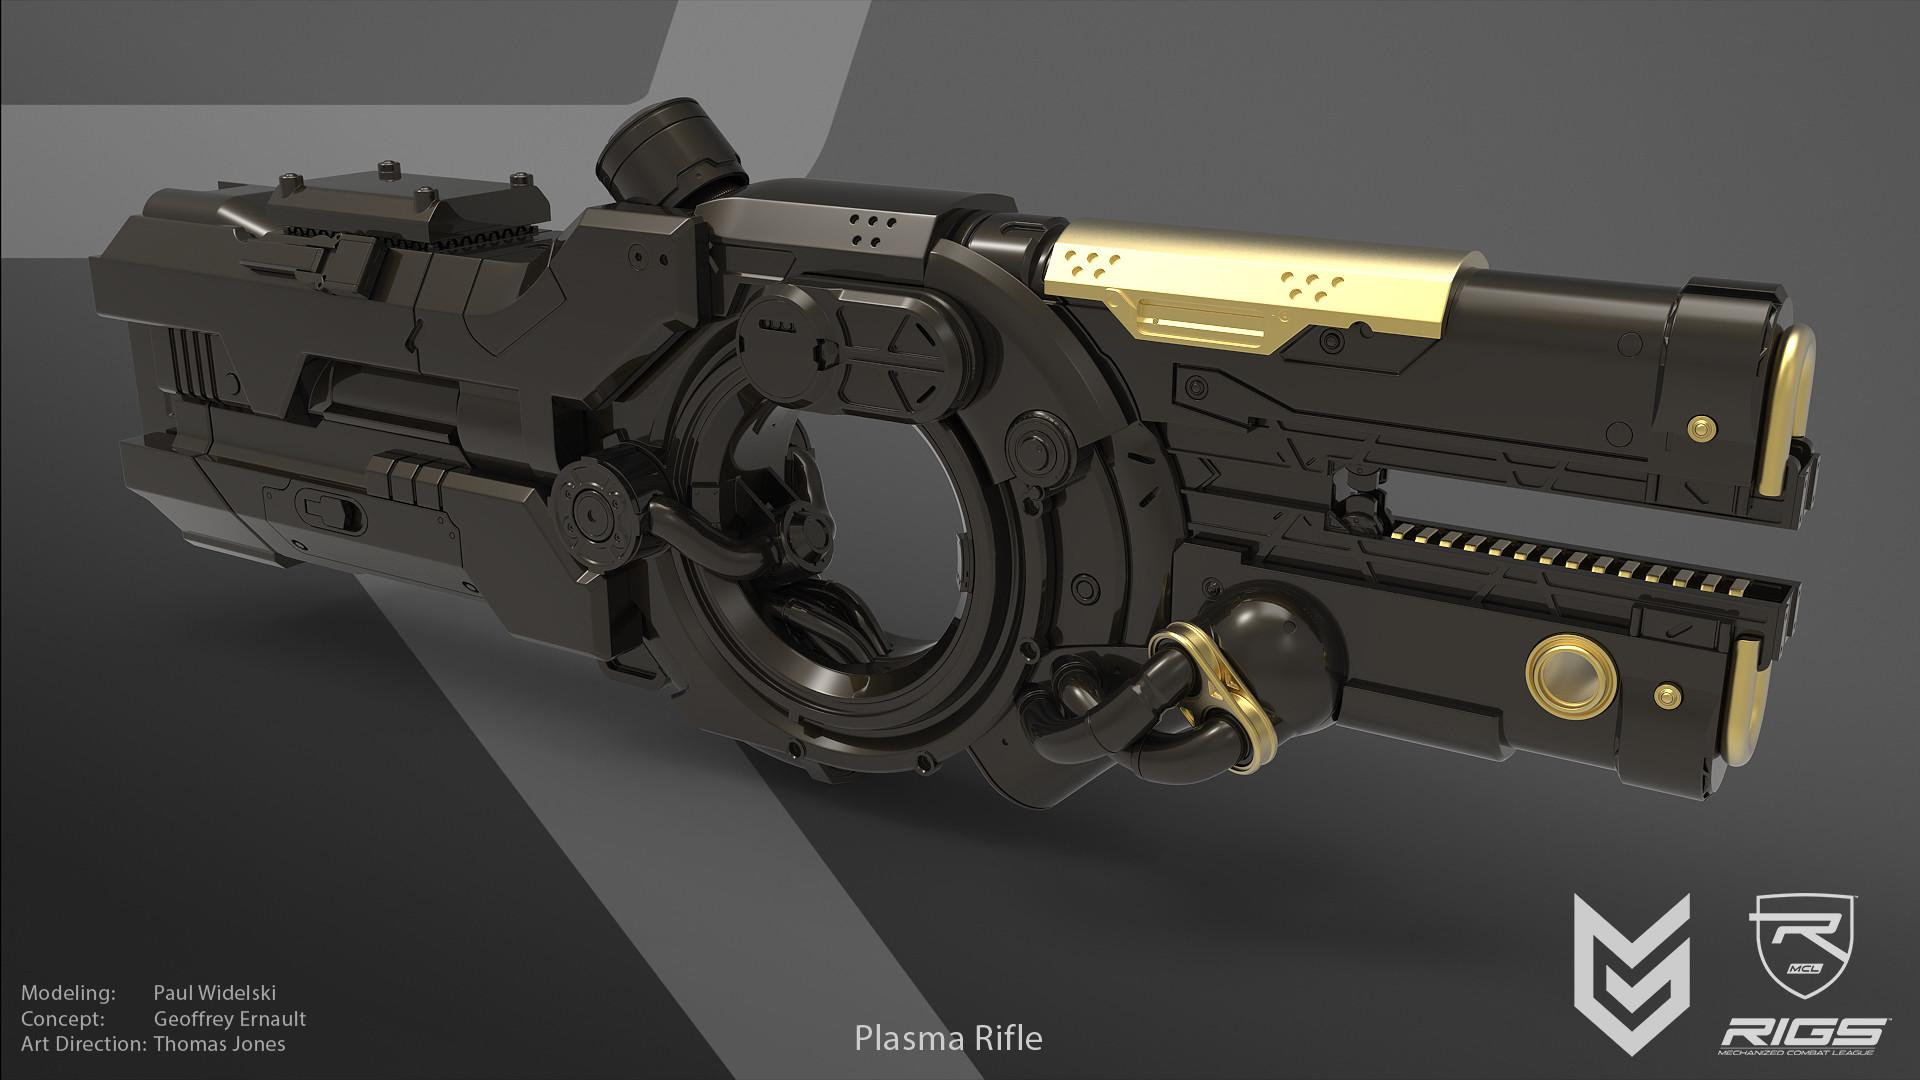 paul-widelski-plasma1.jpg - - Арт, Оружие